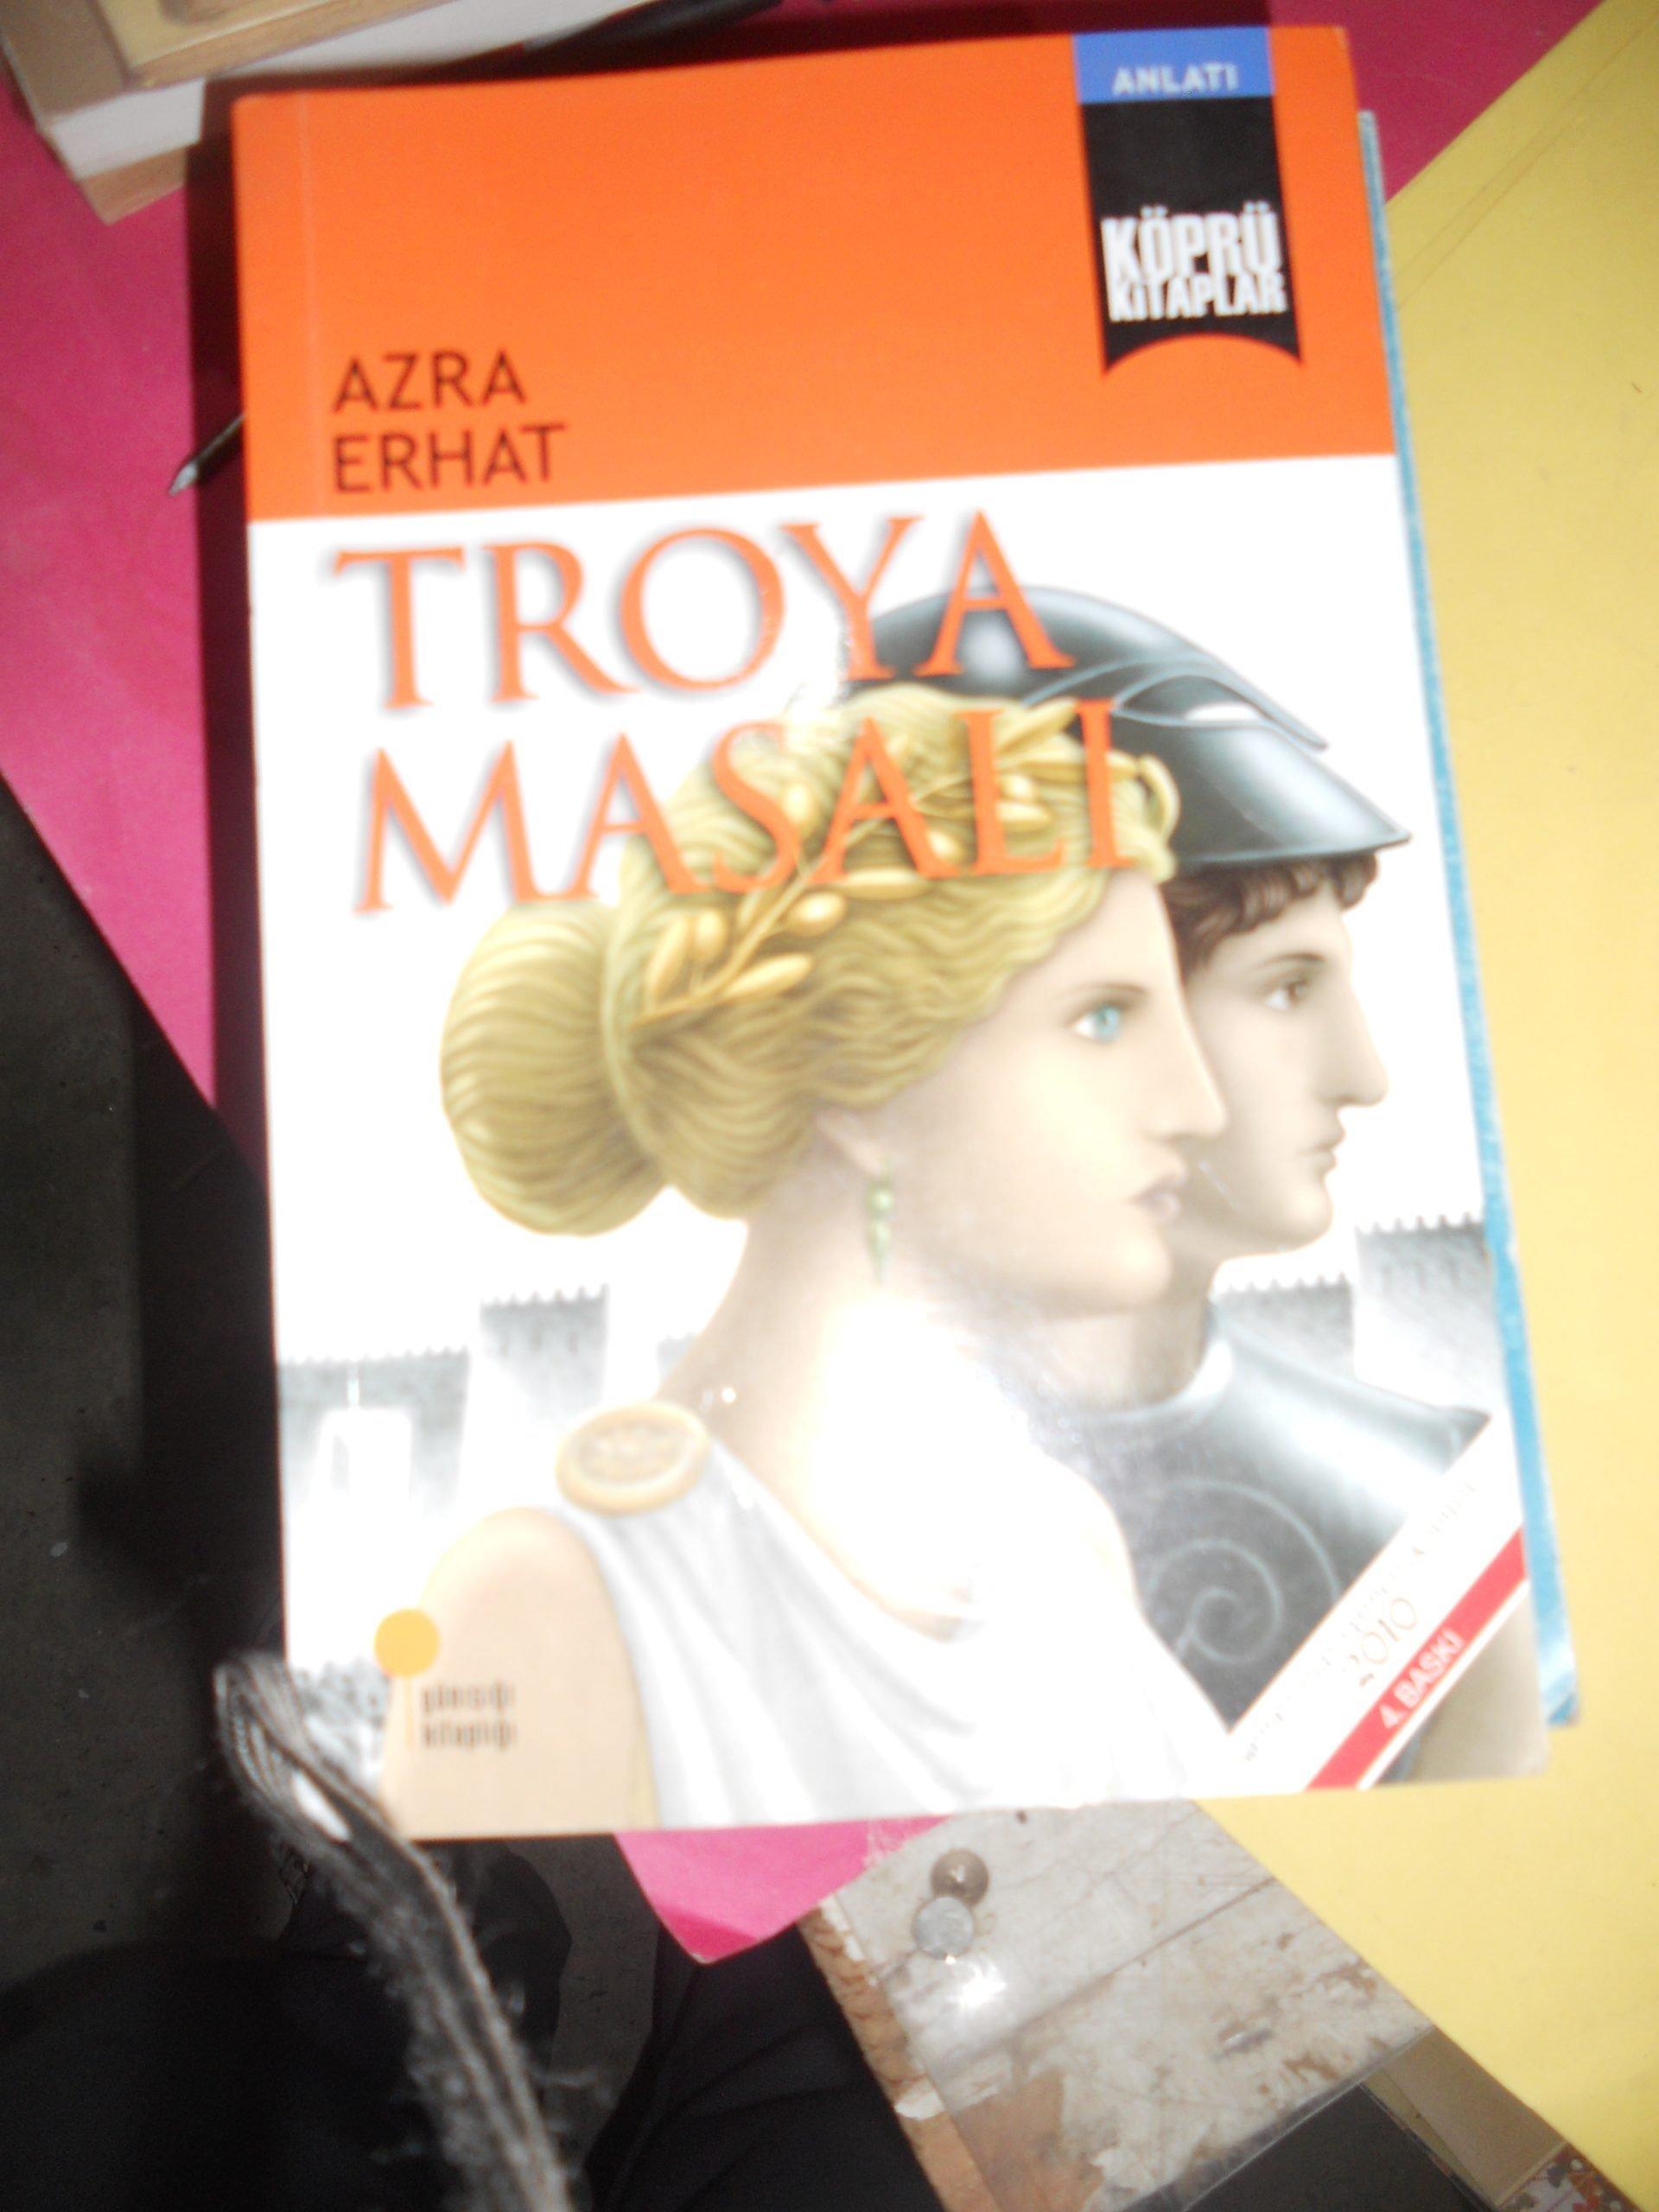 TROYA MASALI/AZRA ERHAT/10 TL